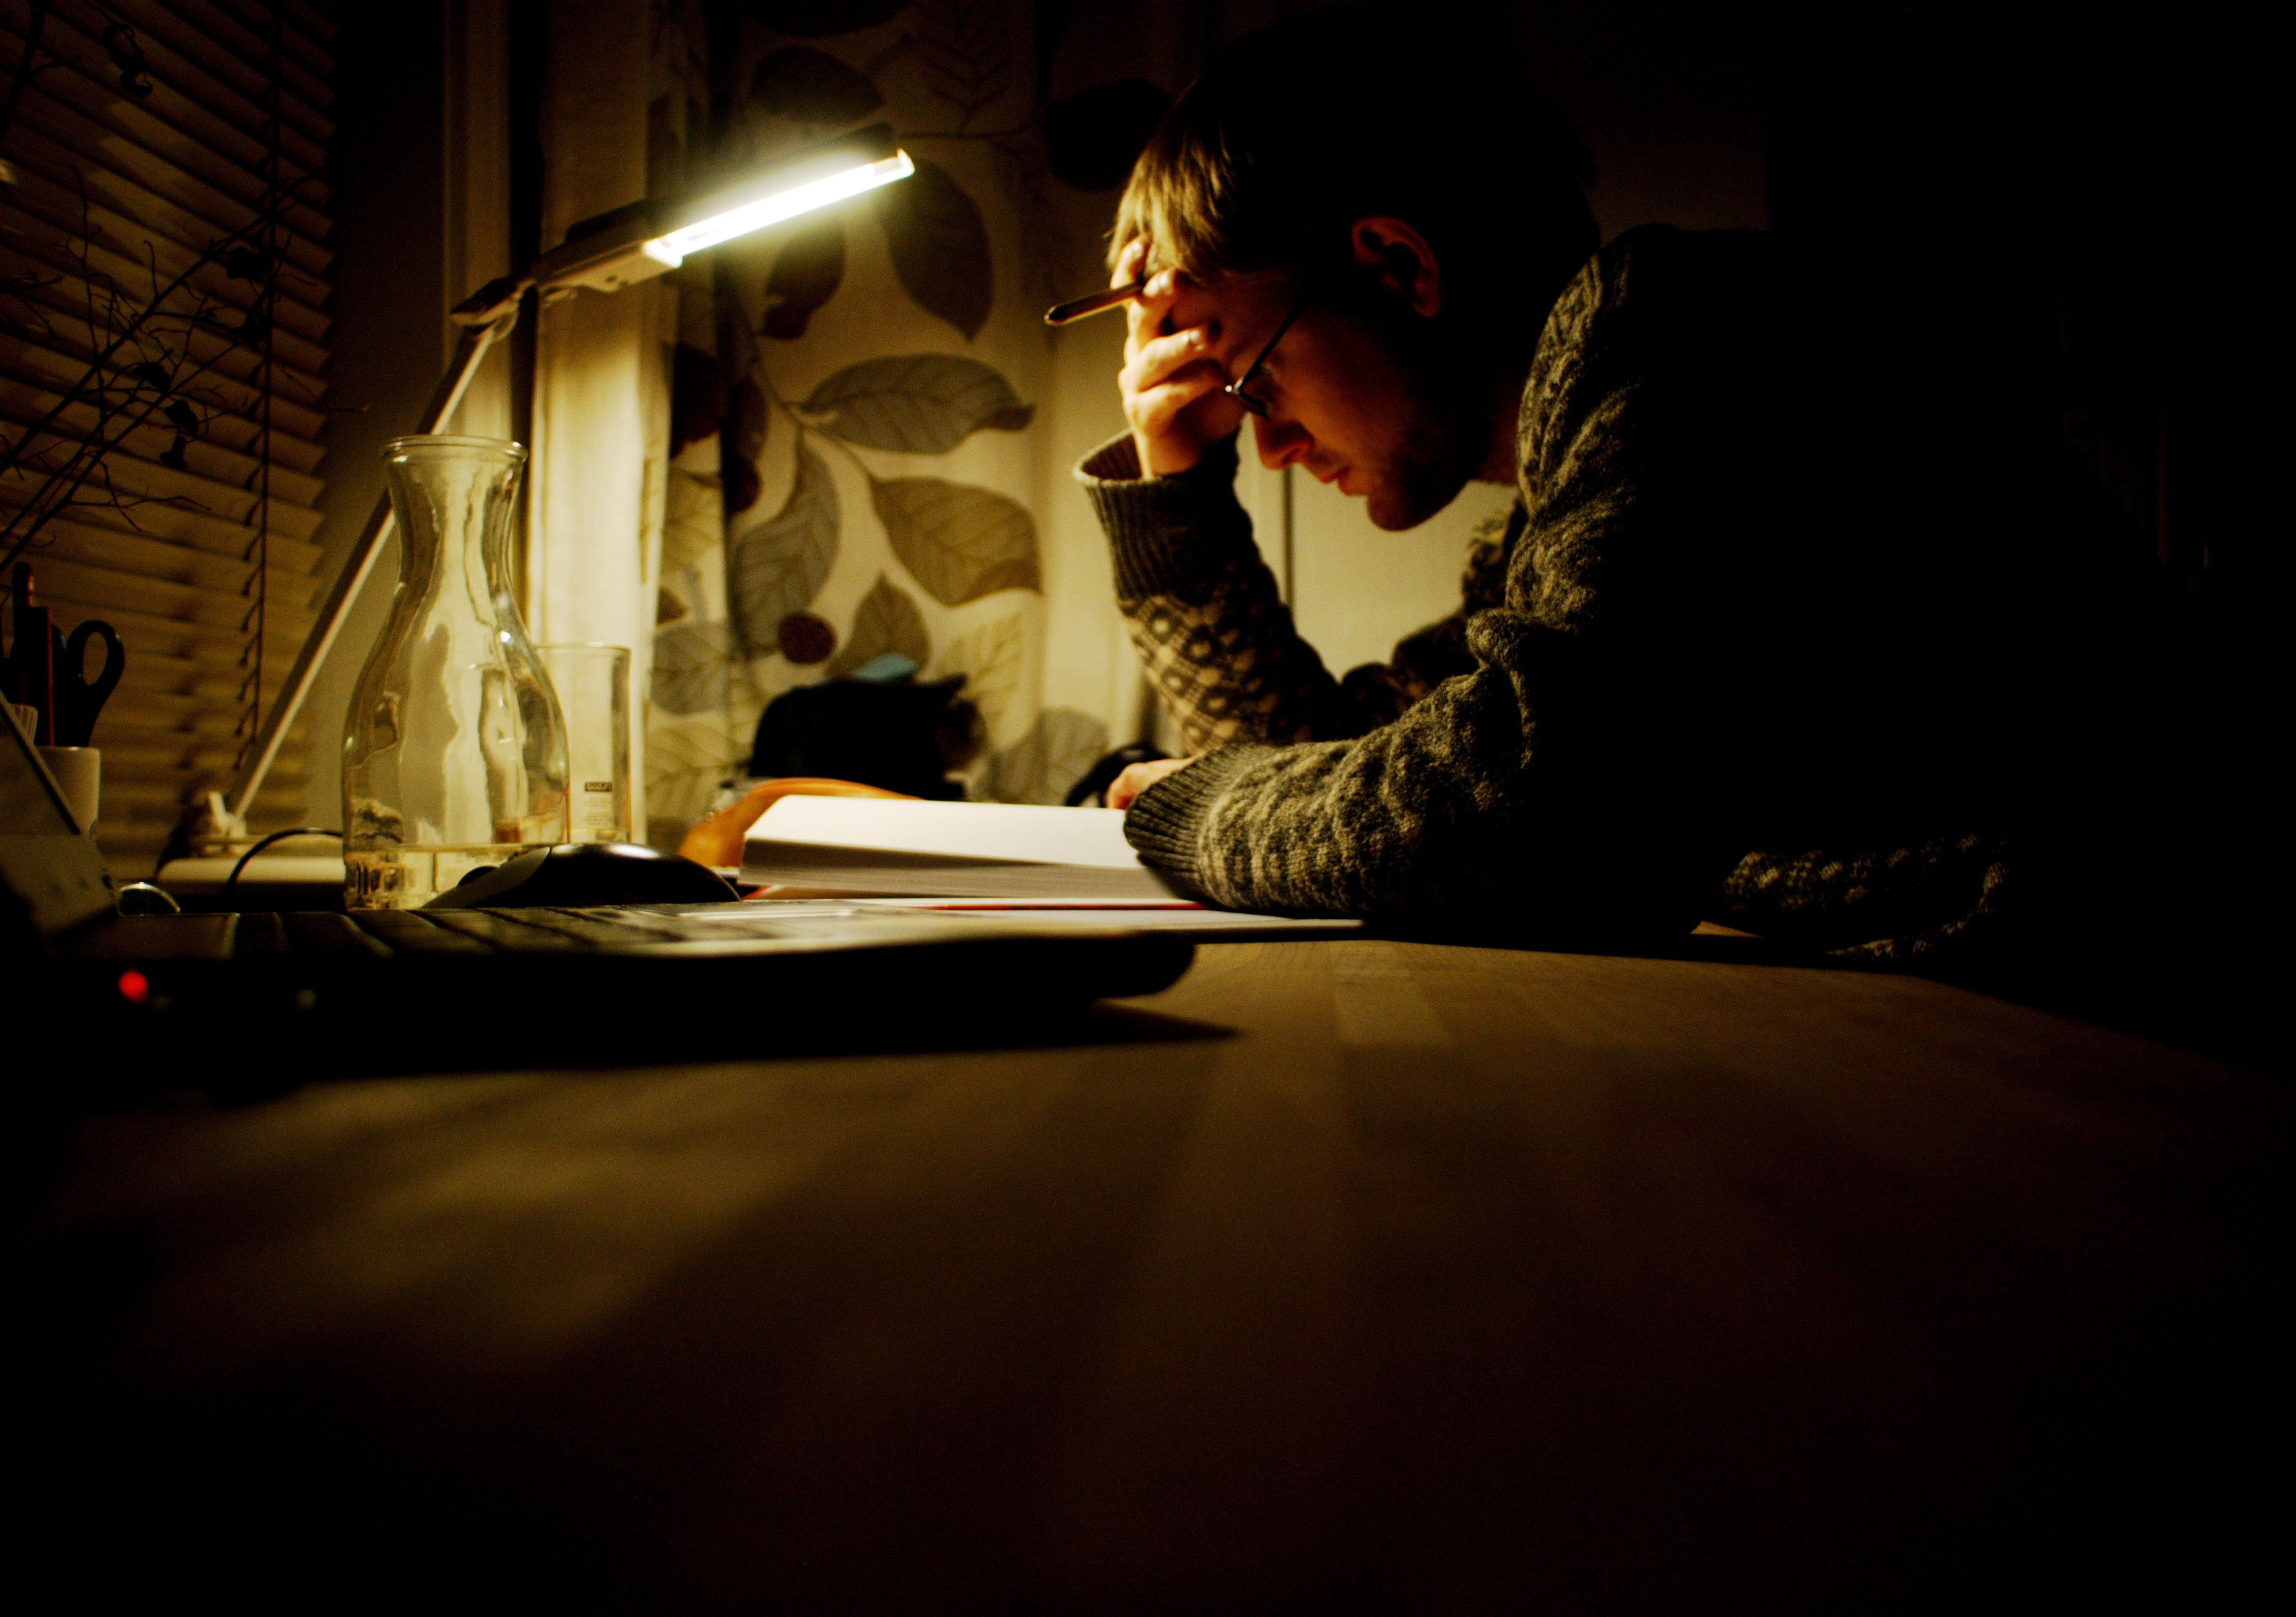 A young man studies at his desk